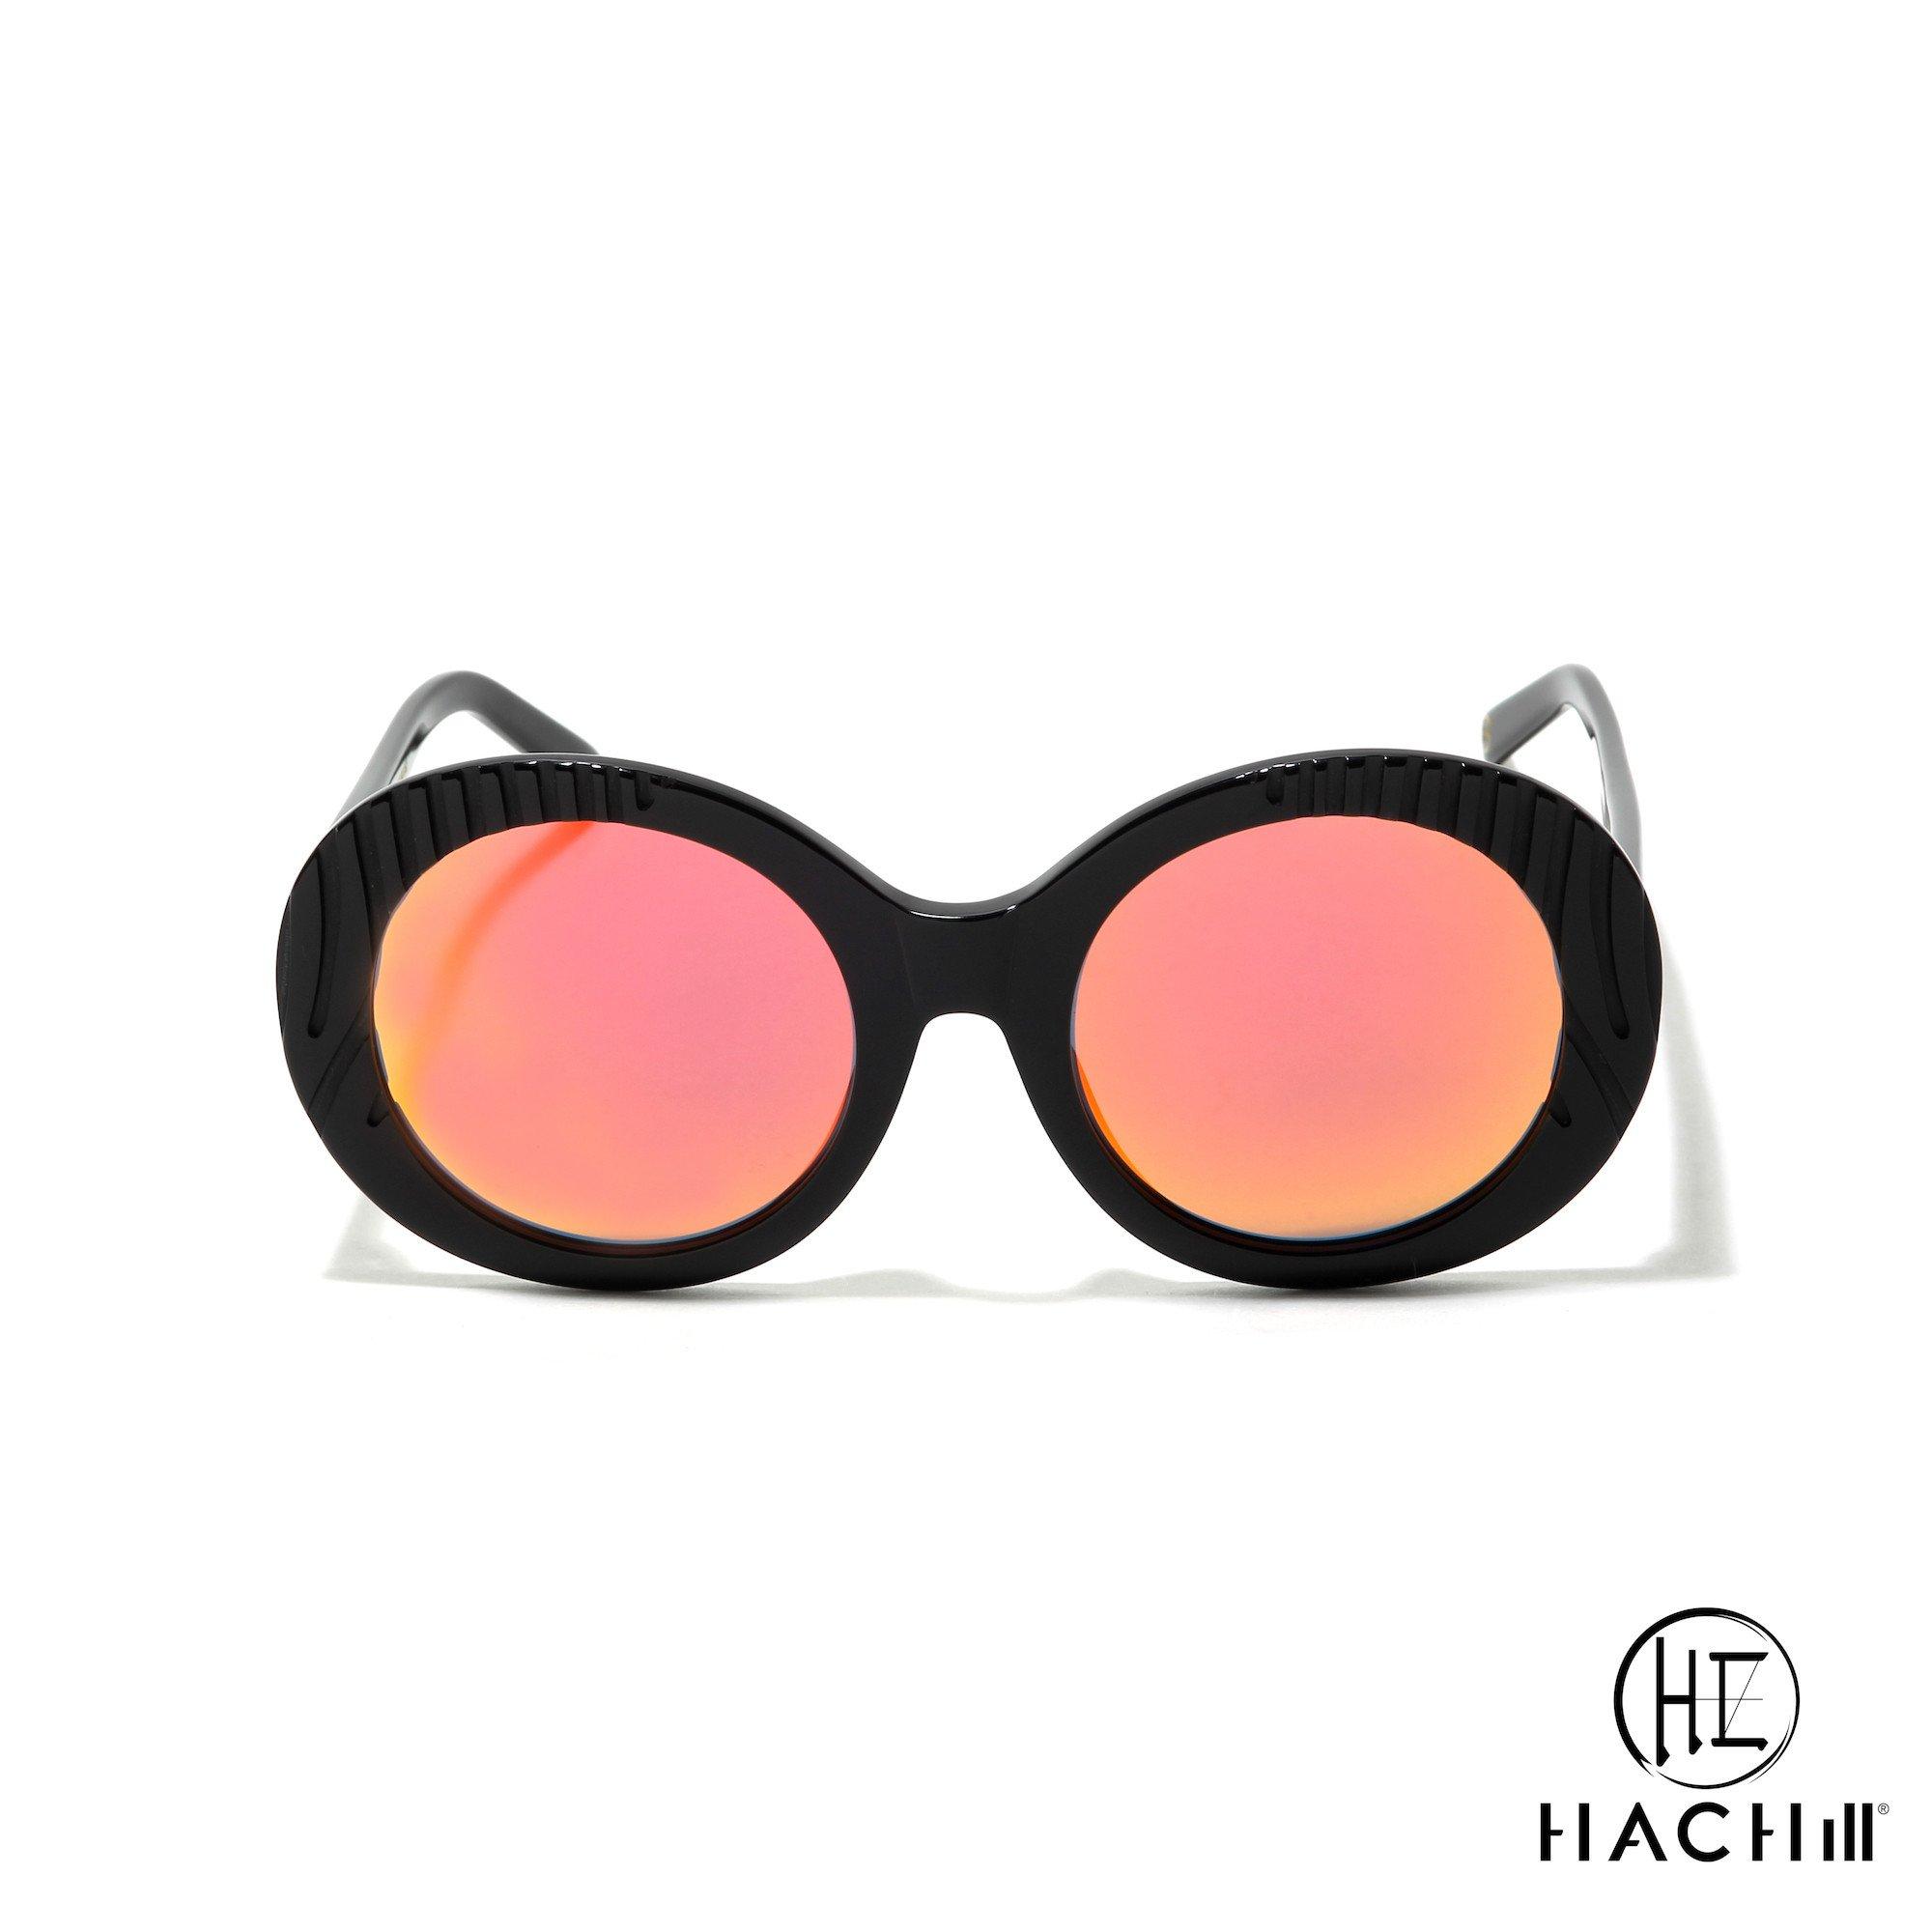 Hachill 太阳眼镜 HC8252S-C1 红色